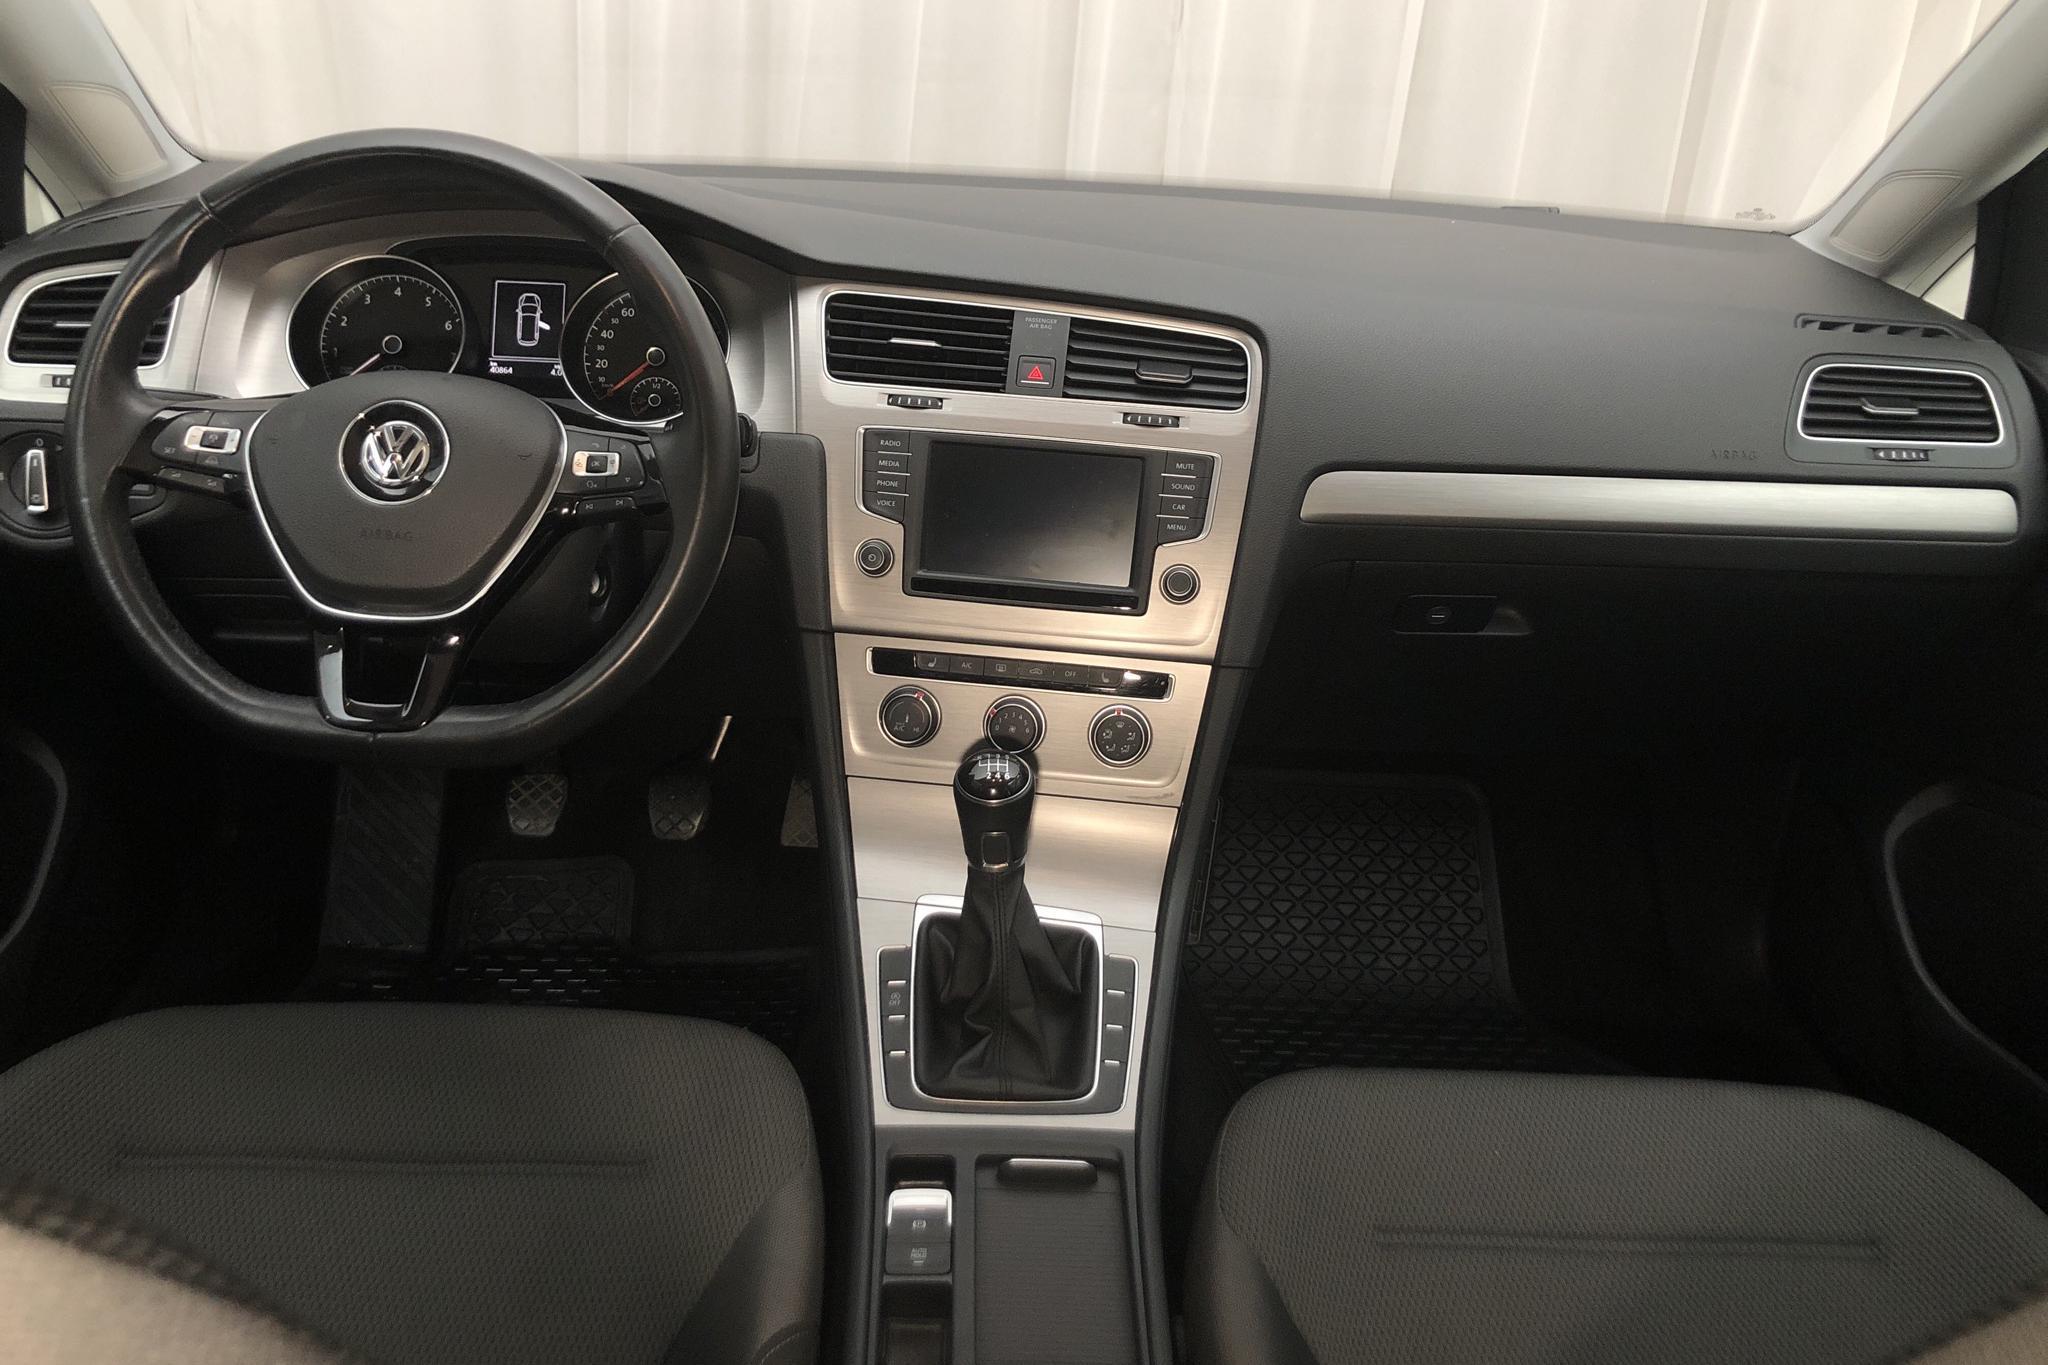 VW Golf VII 1.4 TGI BlueMotion Sportscombi (110hk) - 40 860 km - Manual - white - 2016